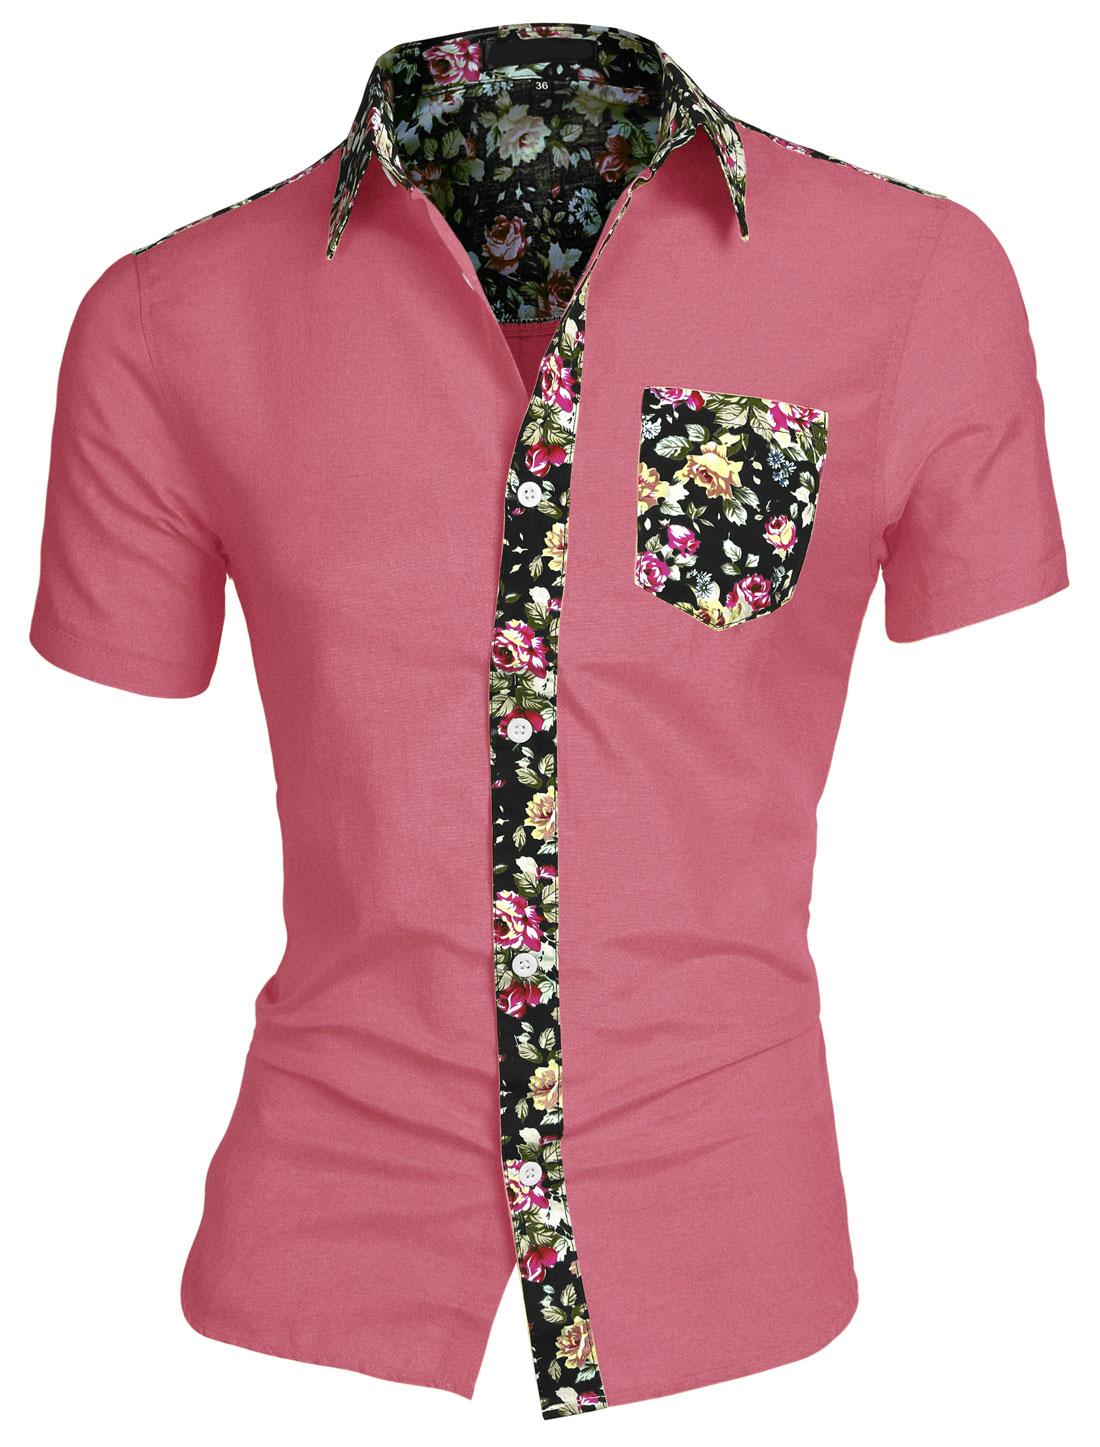 Men Round Hem Floral Print Chest Pocket Short Sleeve Button Down Shirt Fuchsia L